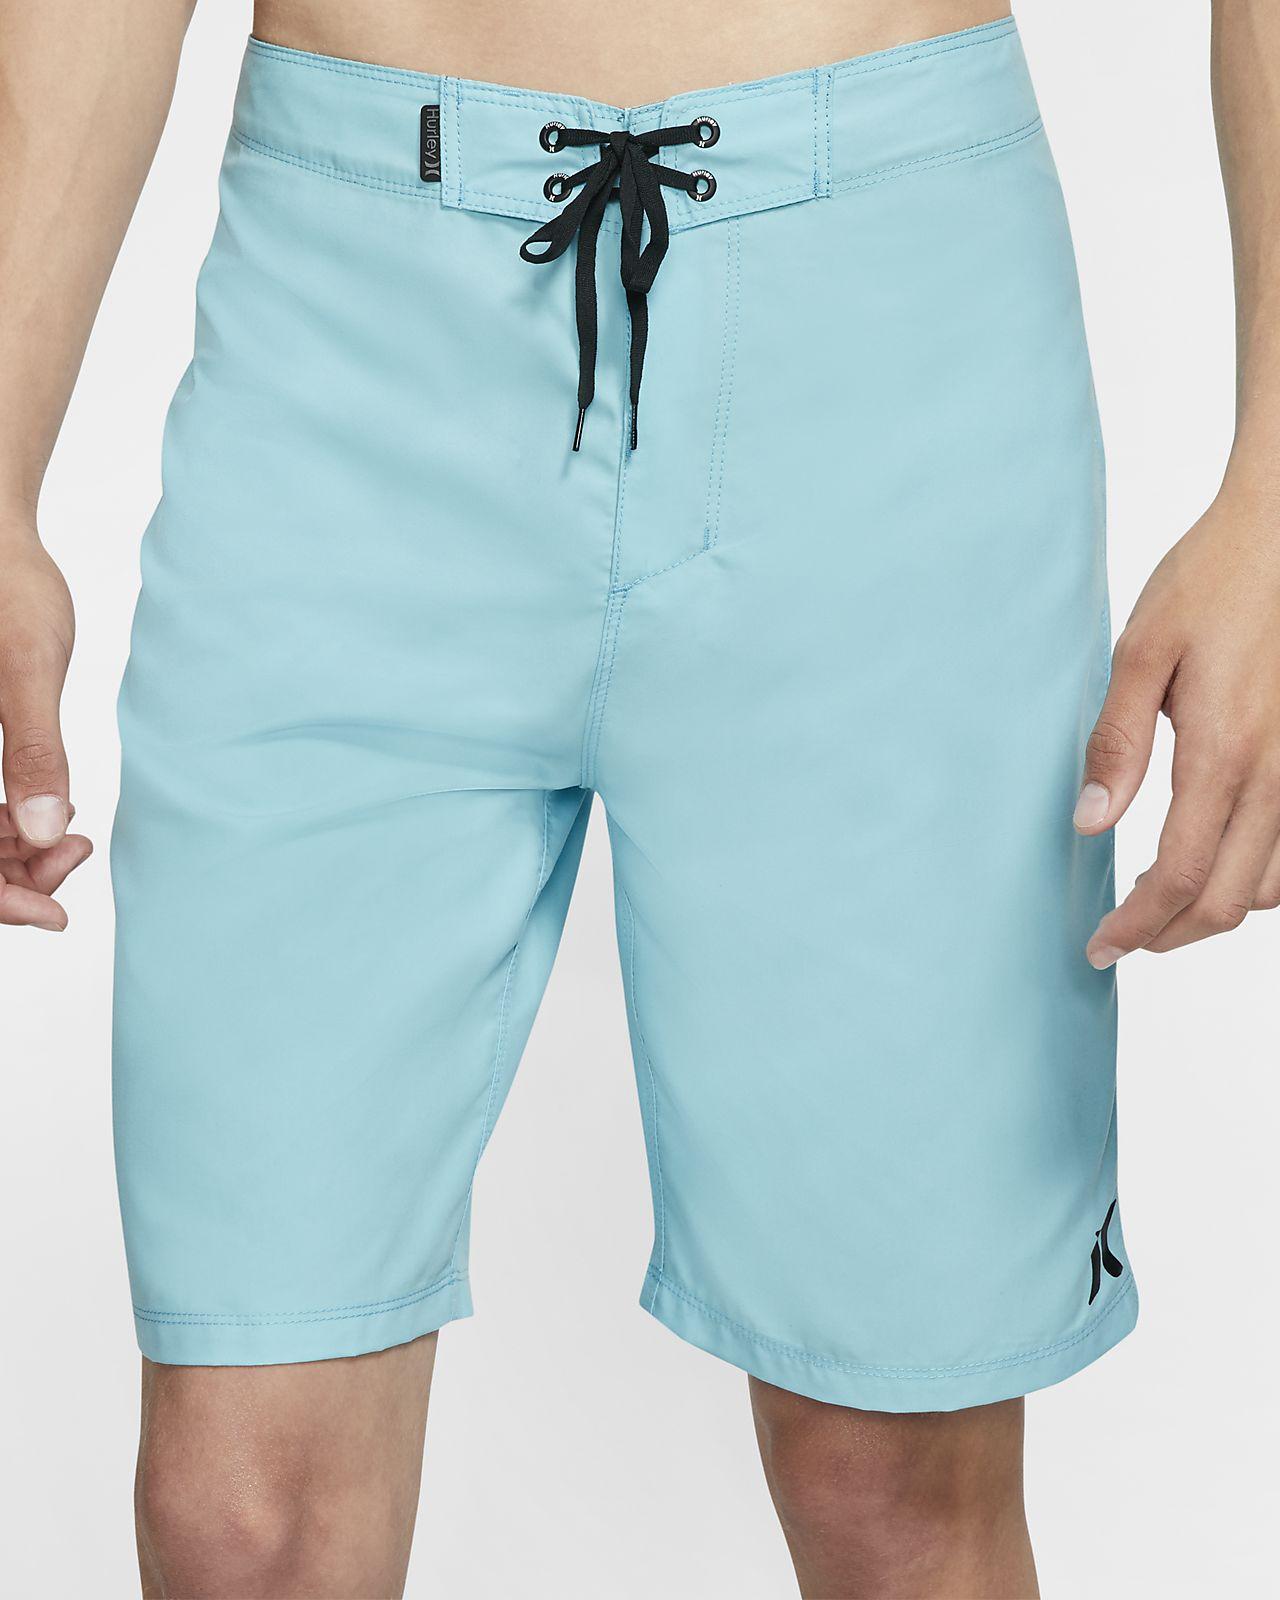 Shorts de playa de 53 cm para hombre Hurley One And Only